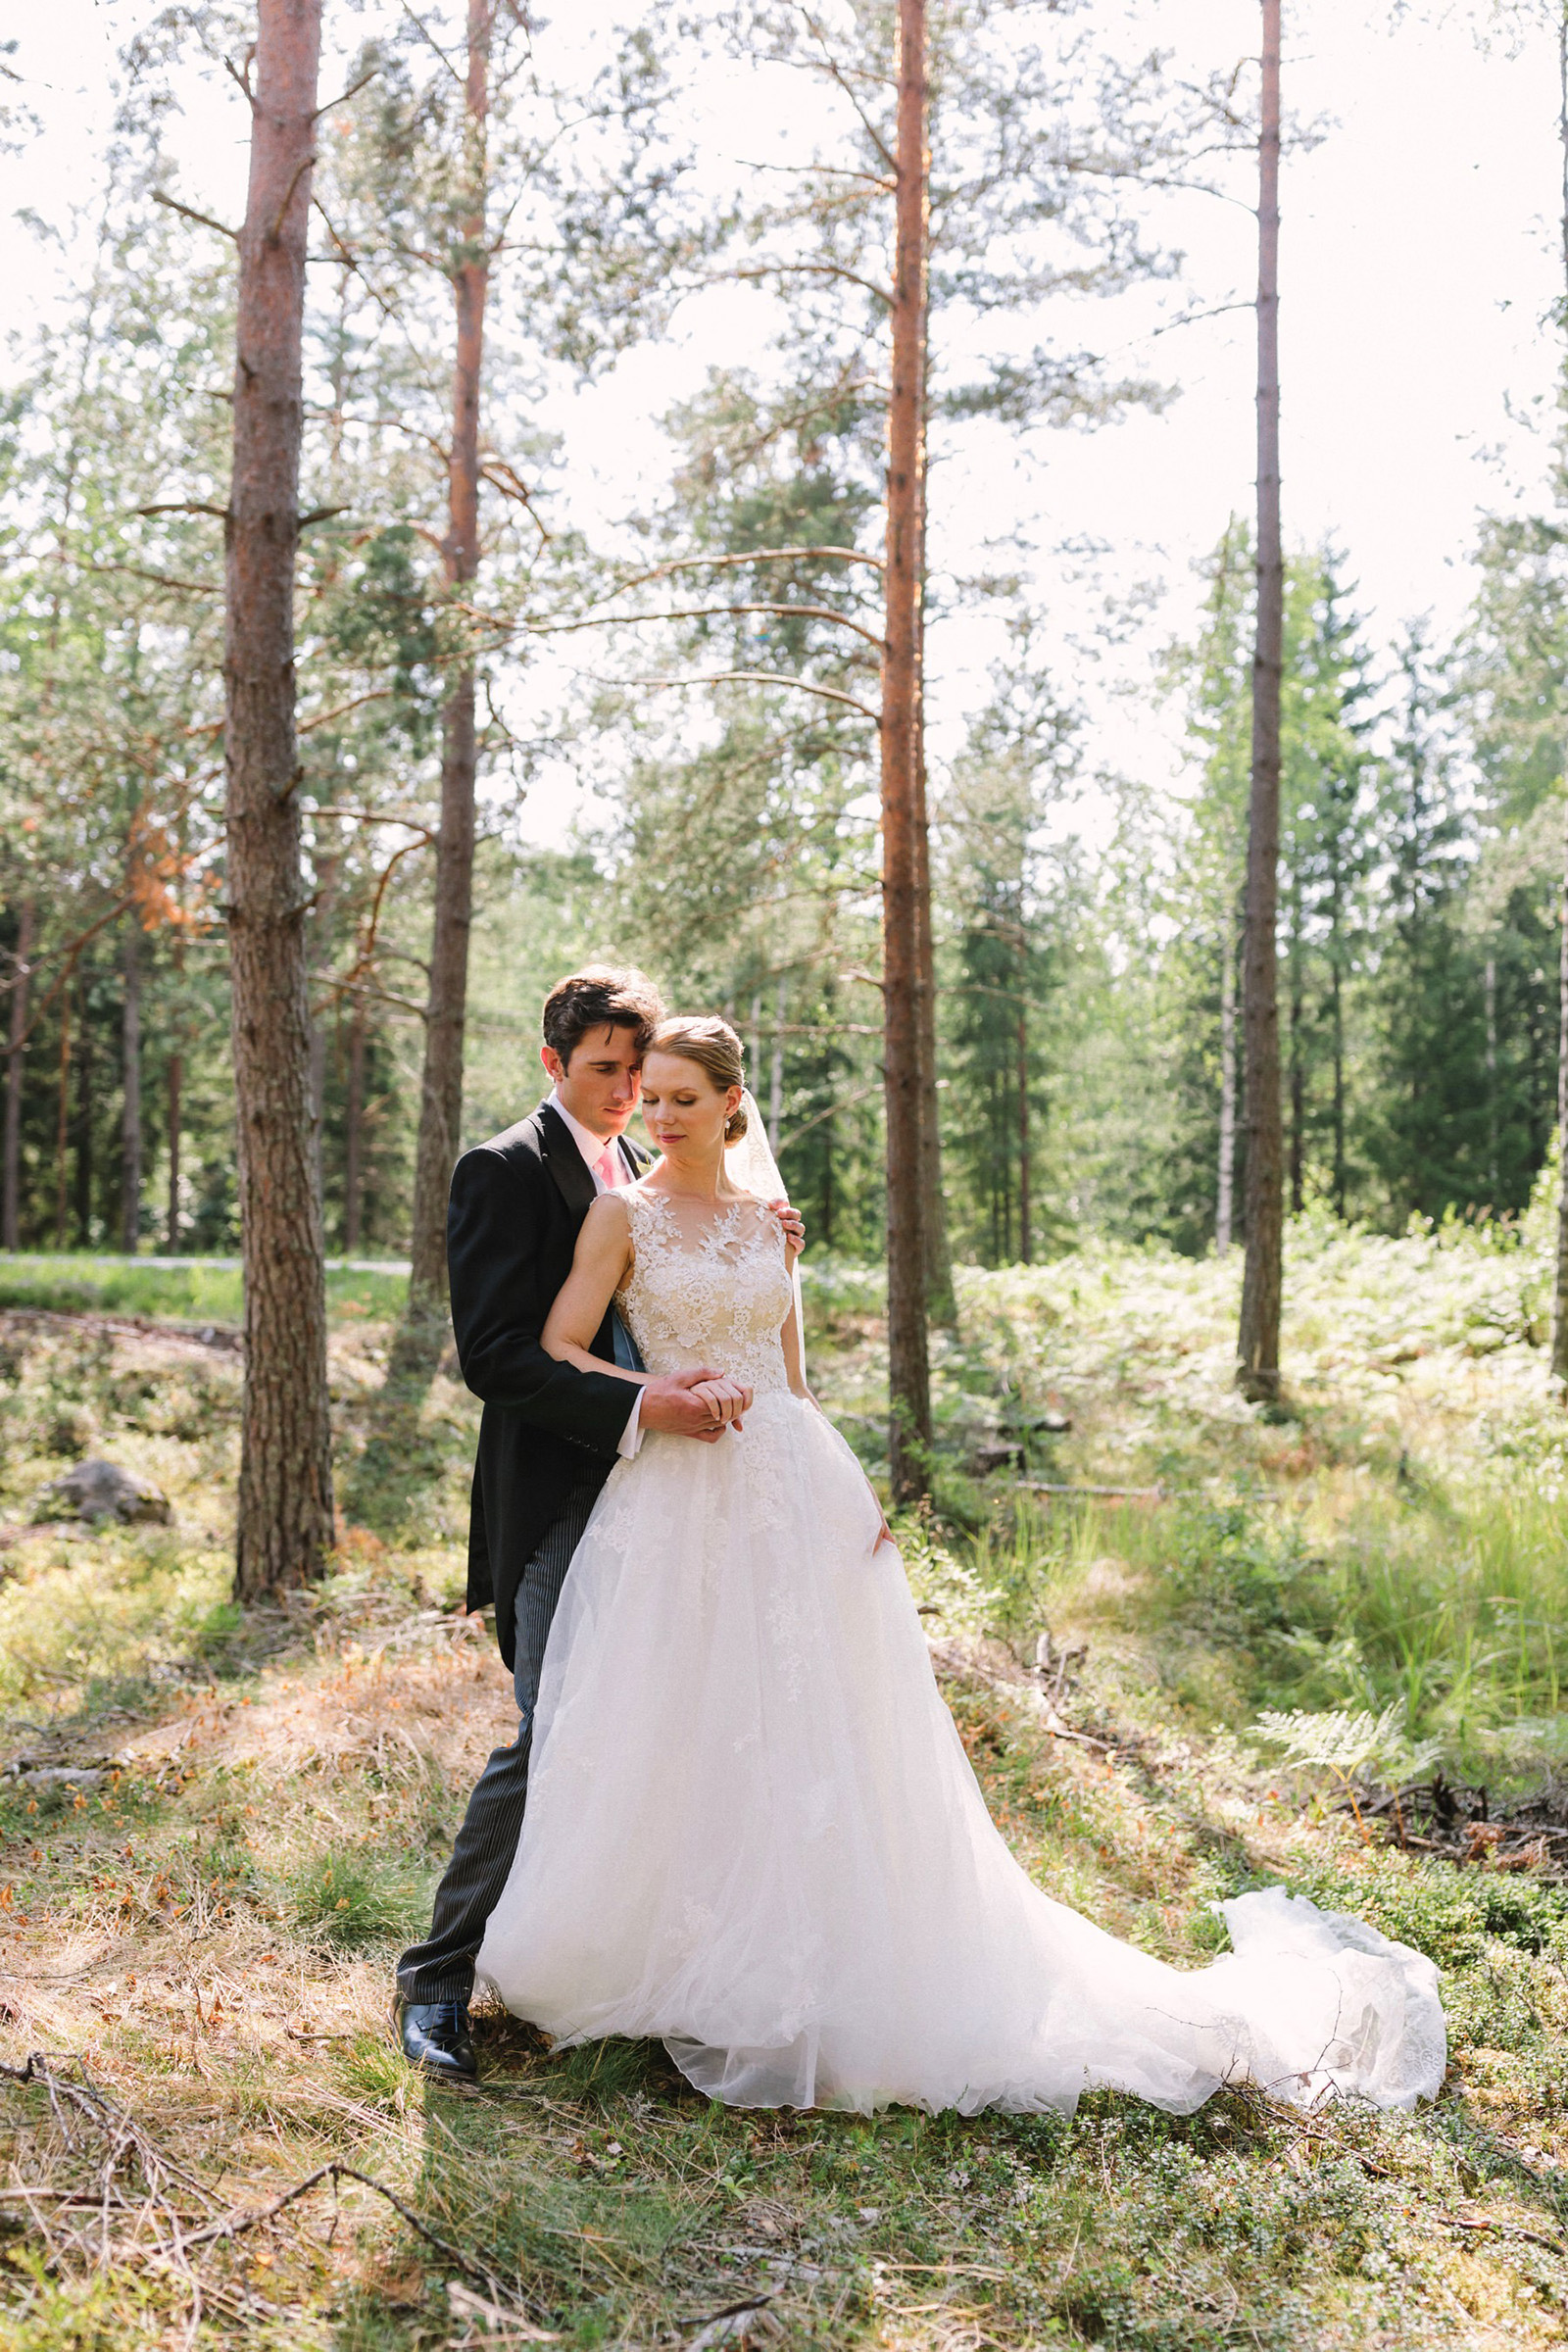 Snappertuna bröllop